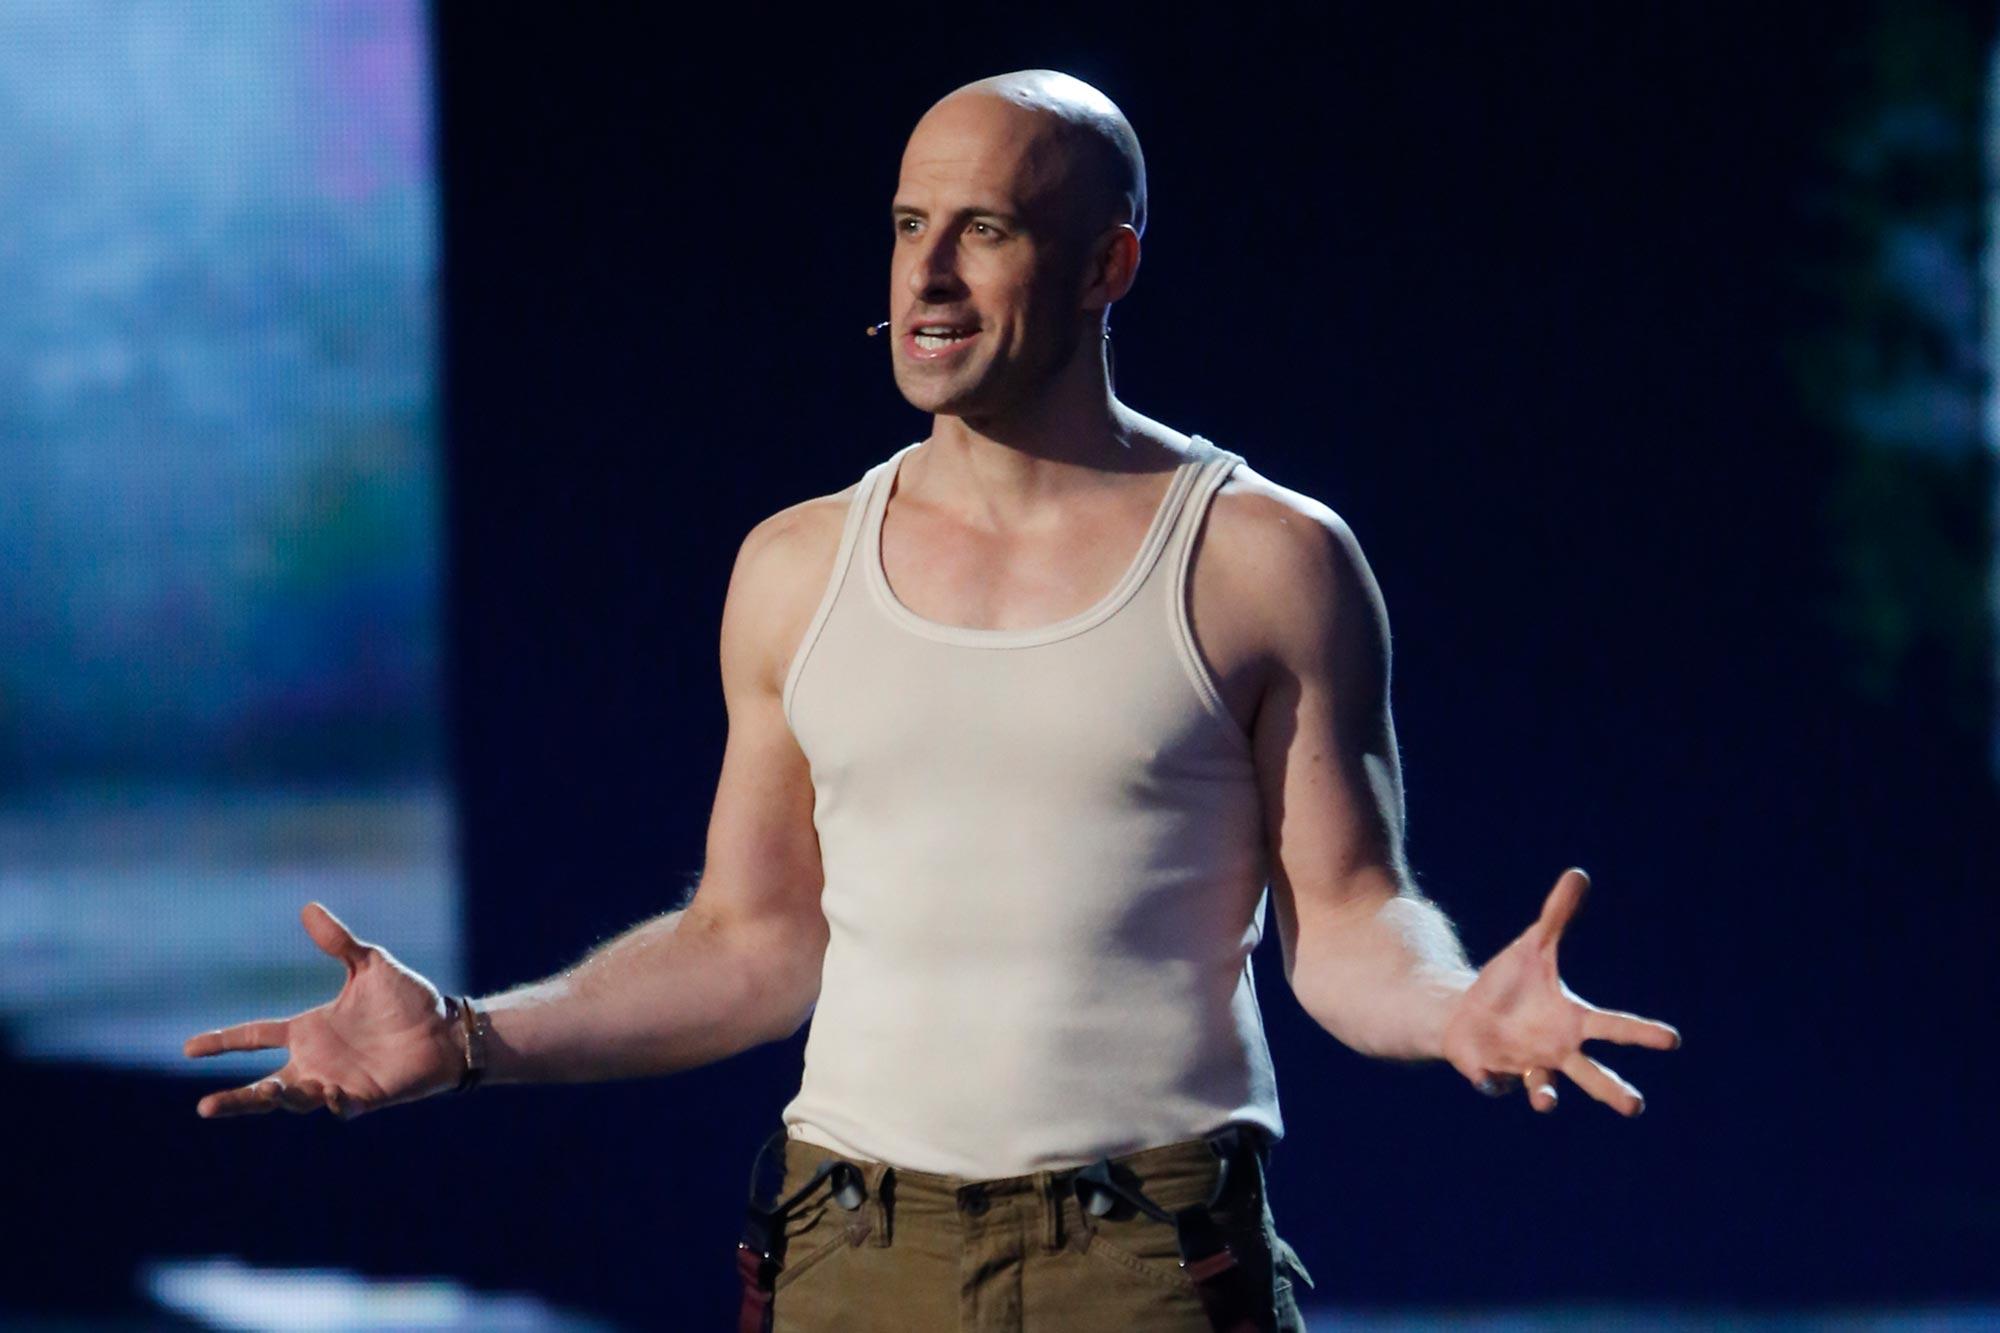 Jonathan Goodwin on America's Got Talent